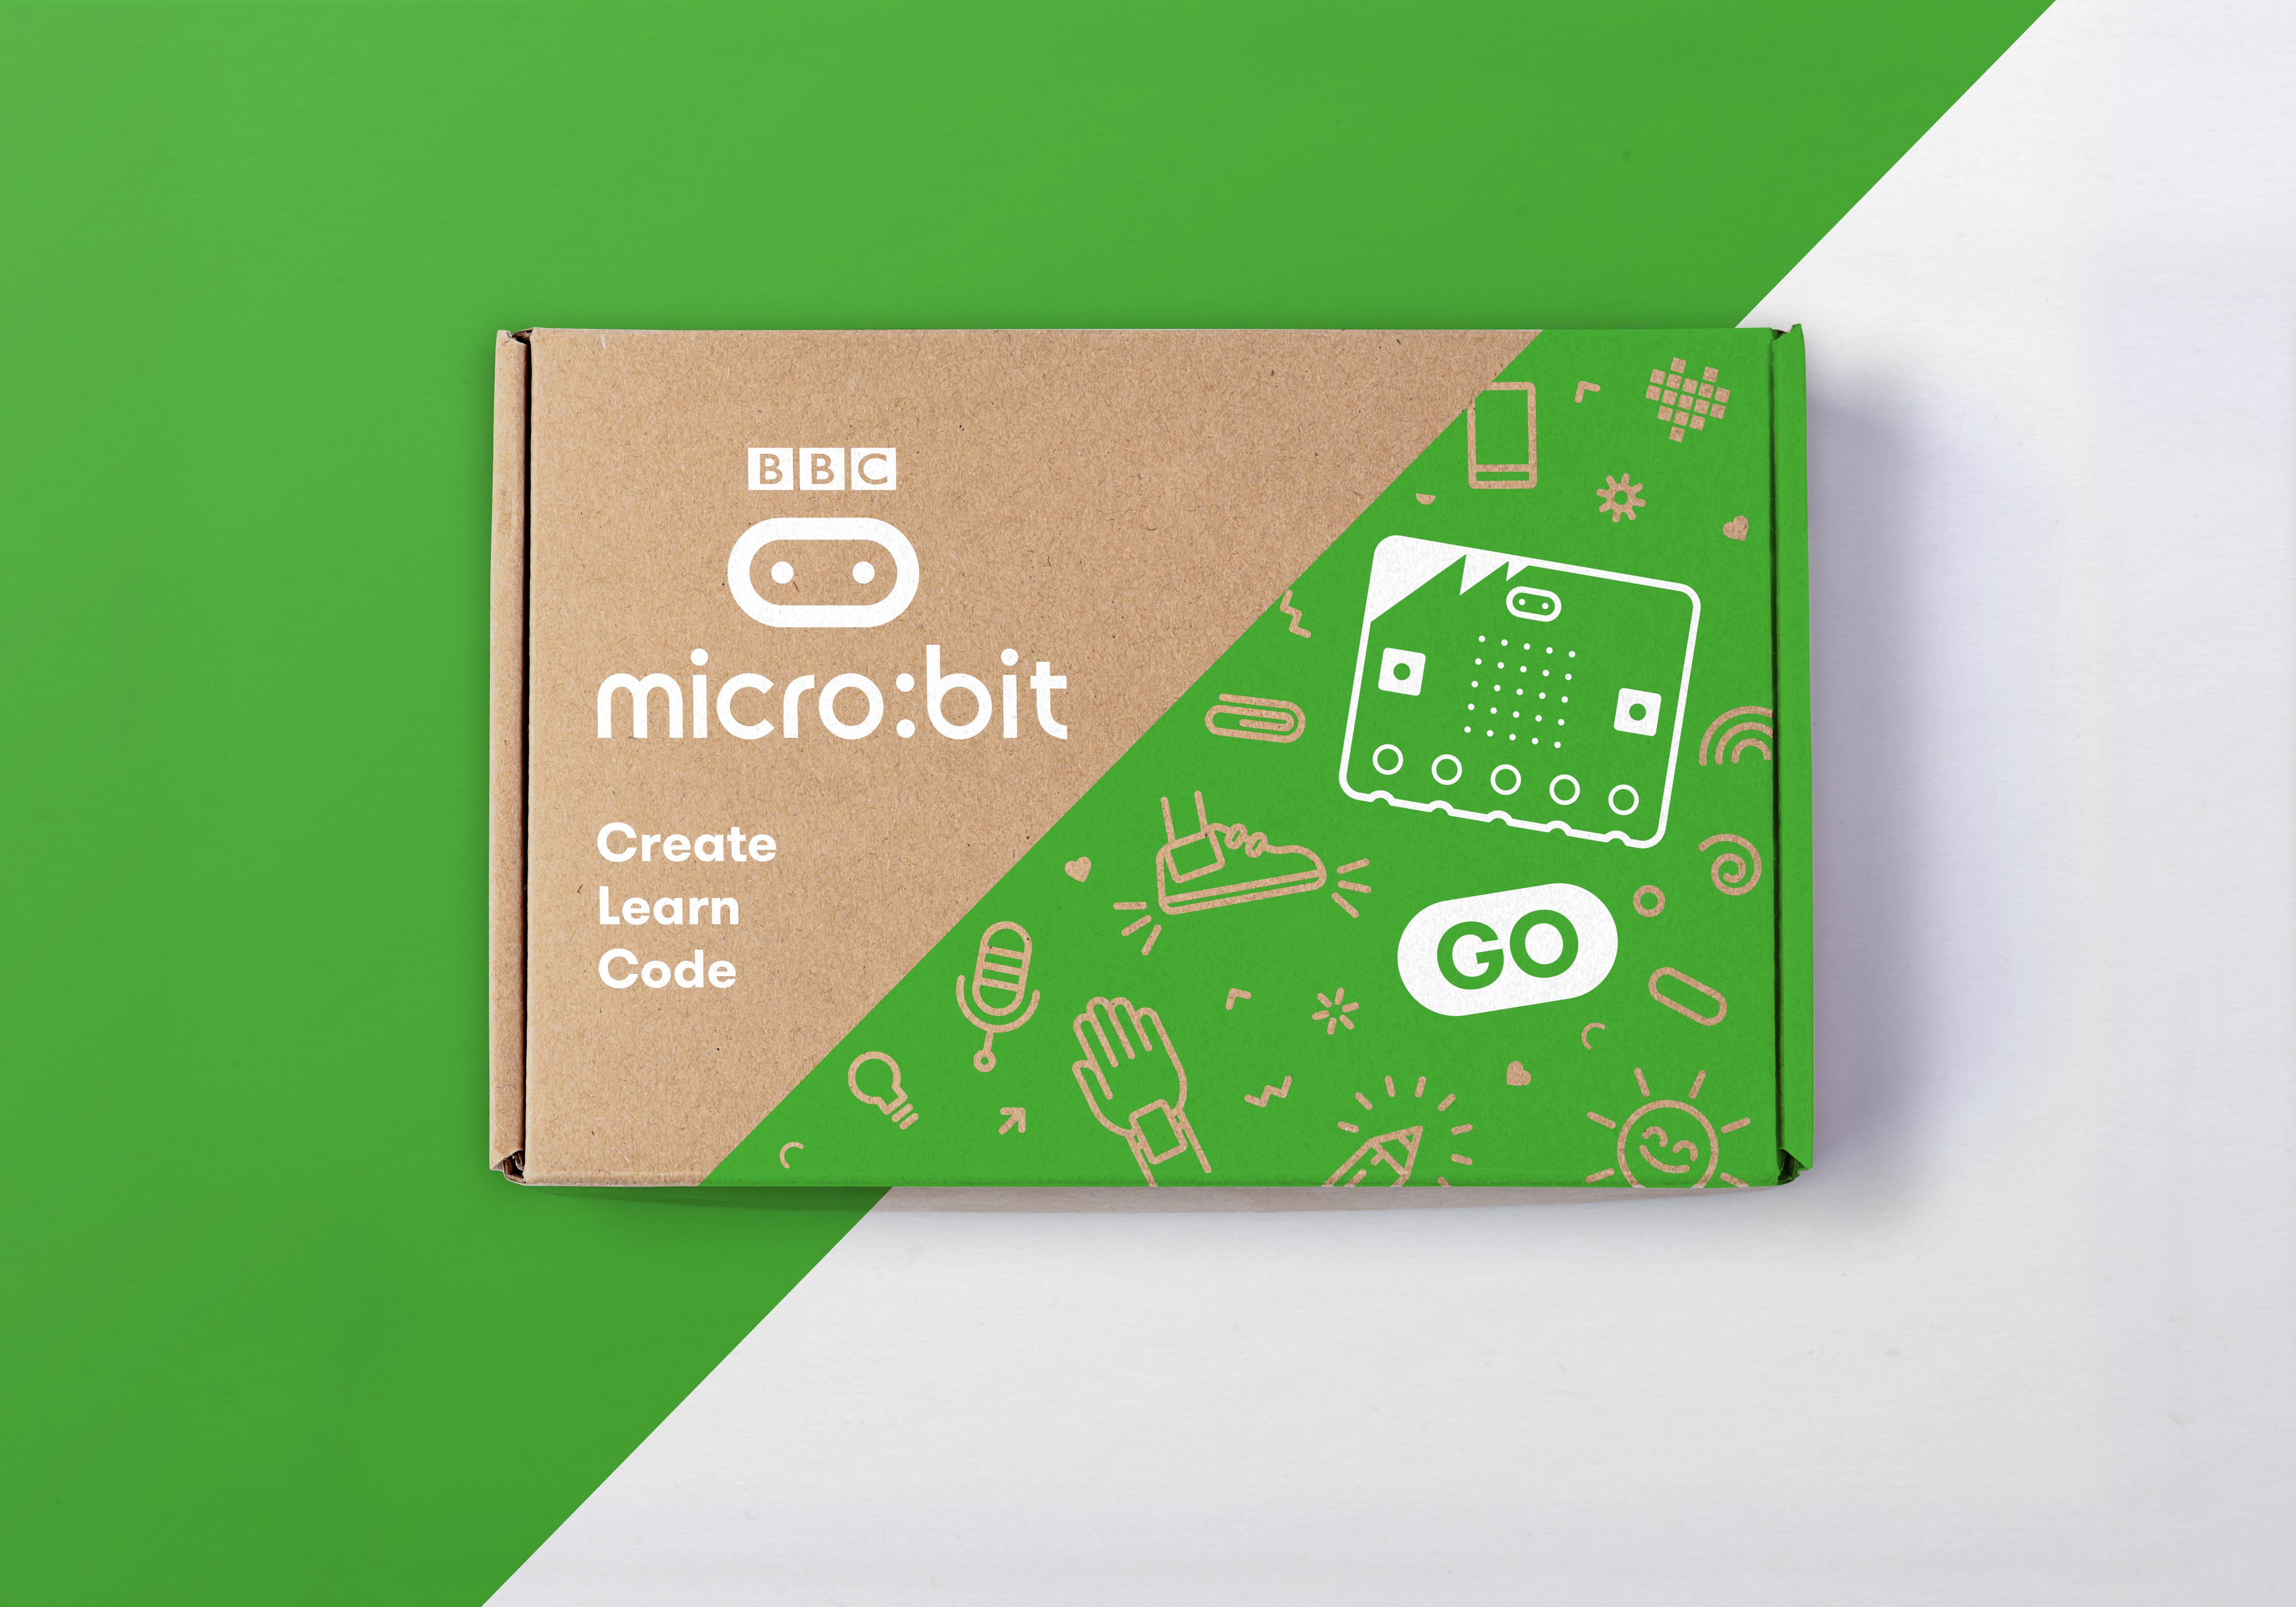 BBC micro:bit Go - Starter Kit